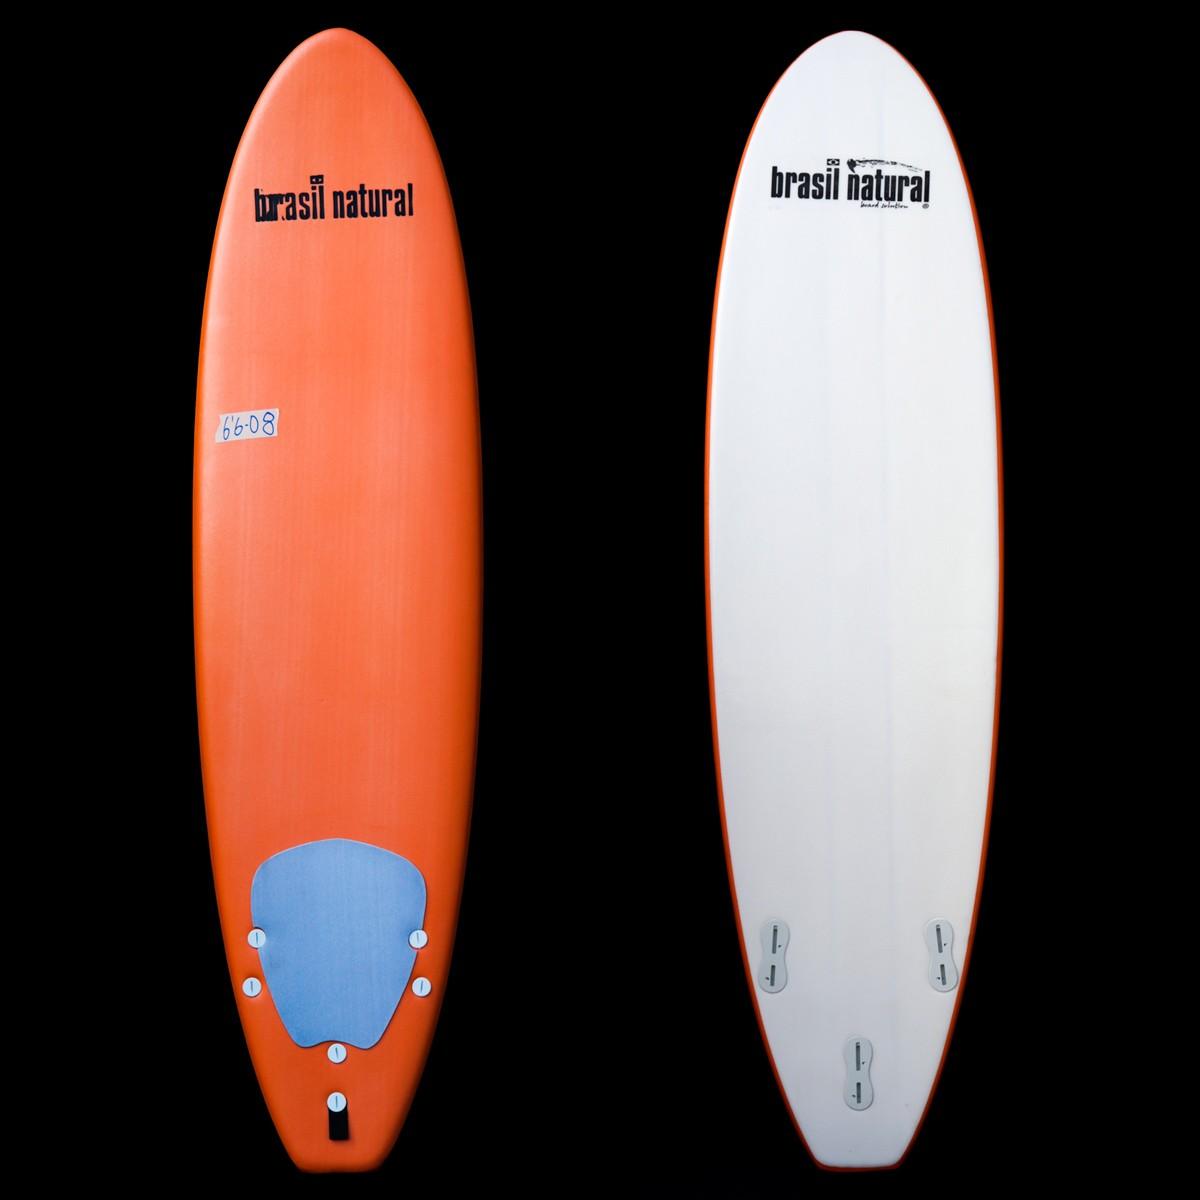 Prancha de surf infantil 6.6 NEW EDITION - OUTLET 08